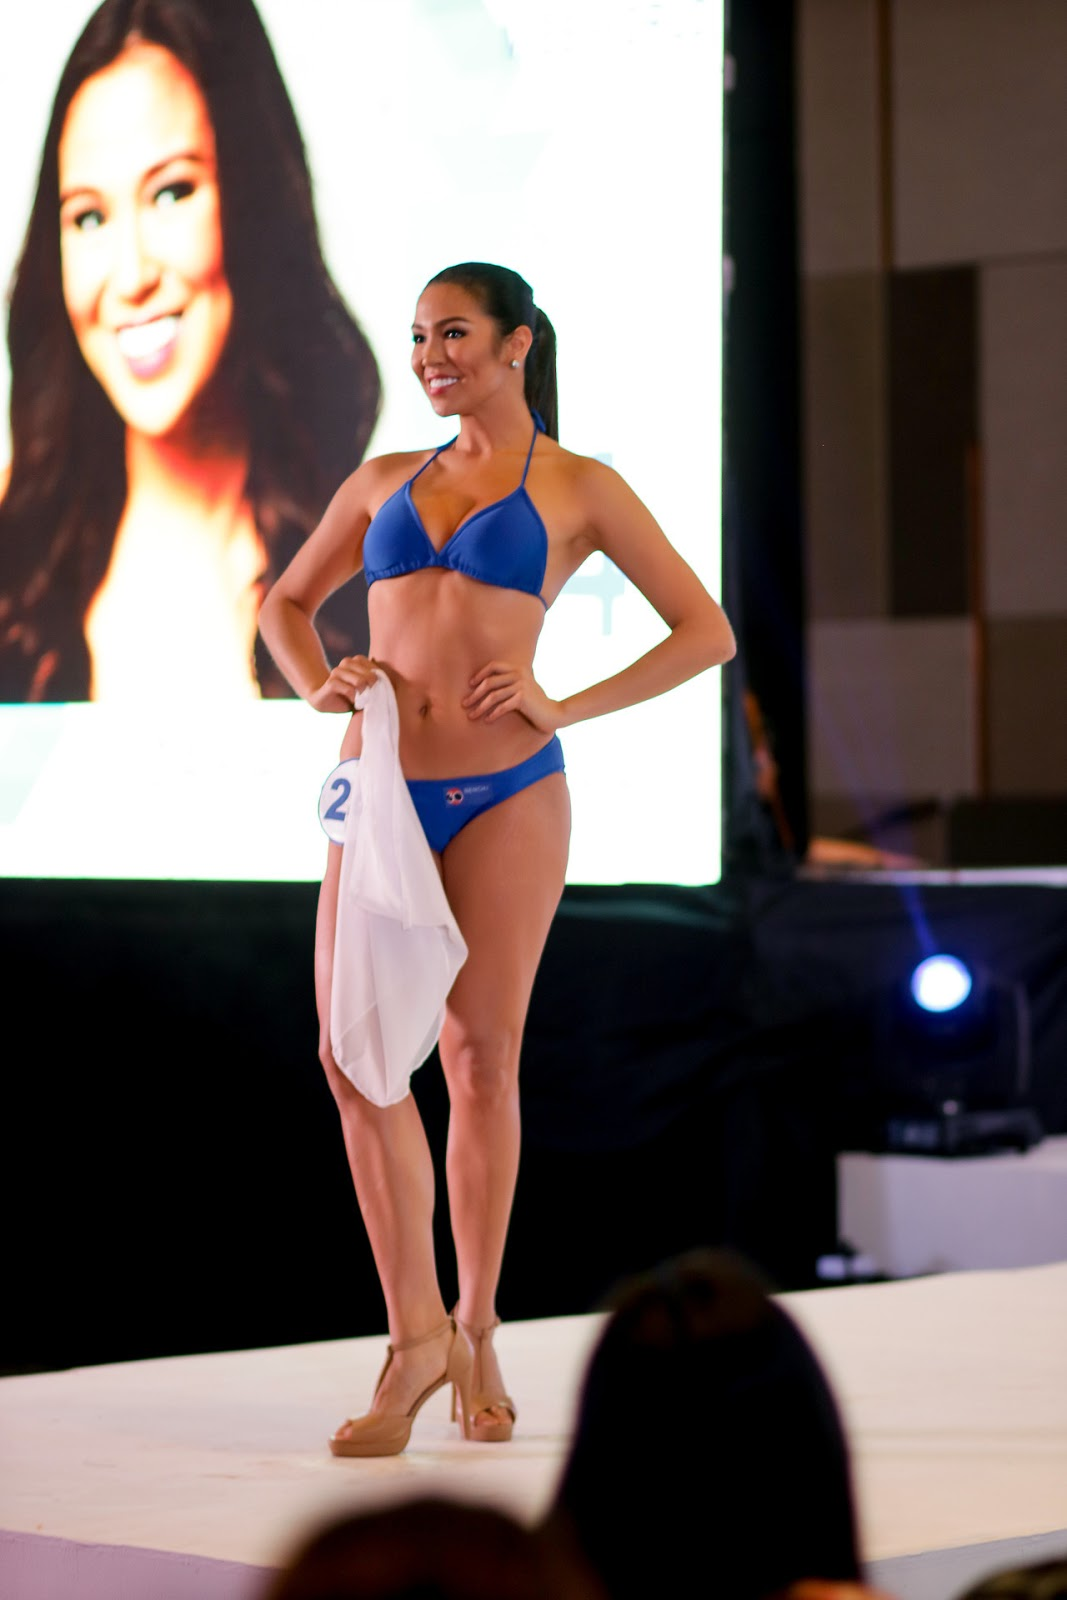 Bikini Stephanie Borja naked (44 photos), Topless, Cleavage, Instagram, swimsuit 2017